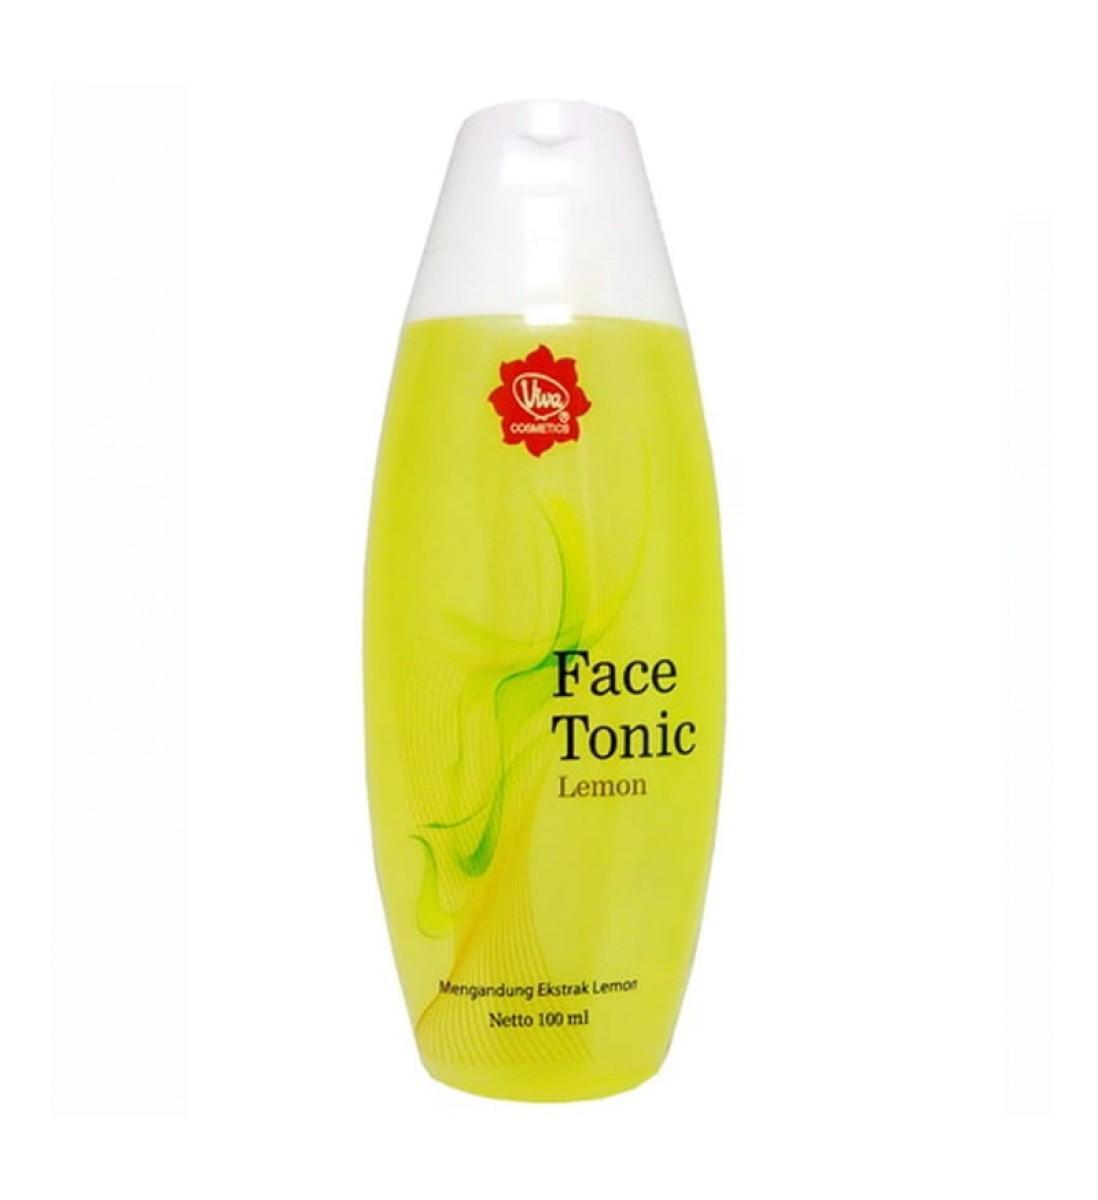 VIVA Face Tonic Lemon 100ml